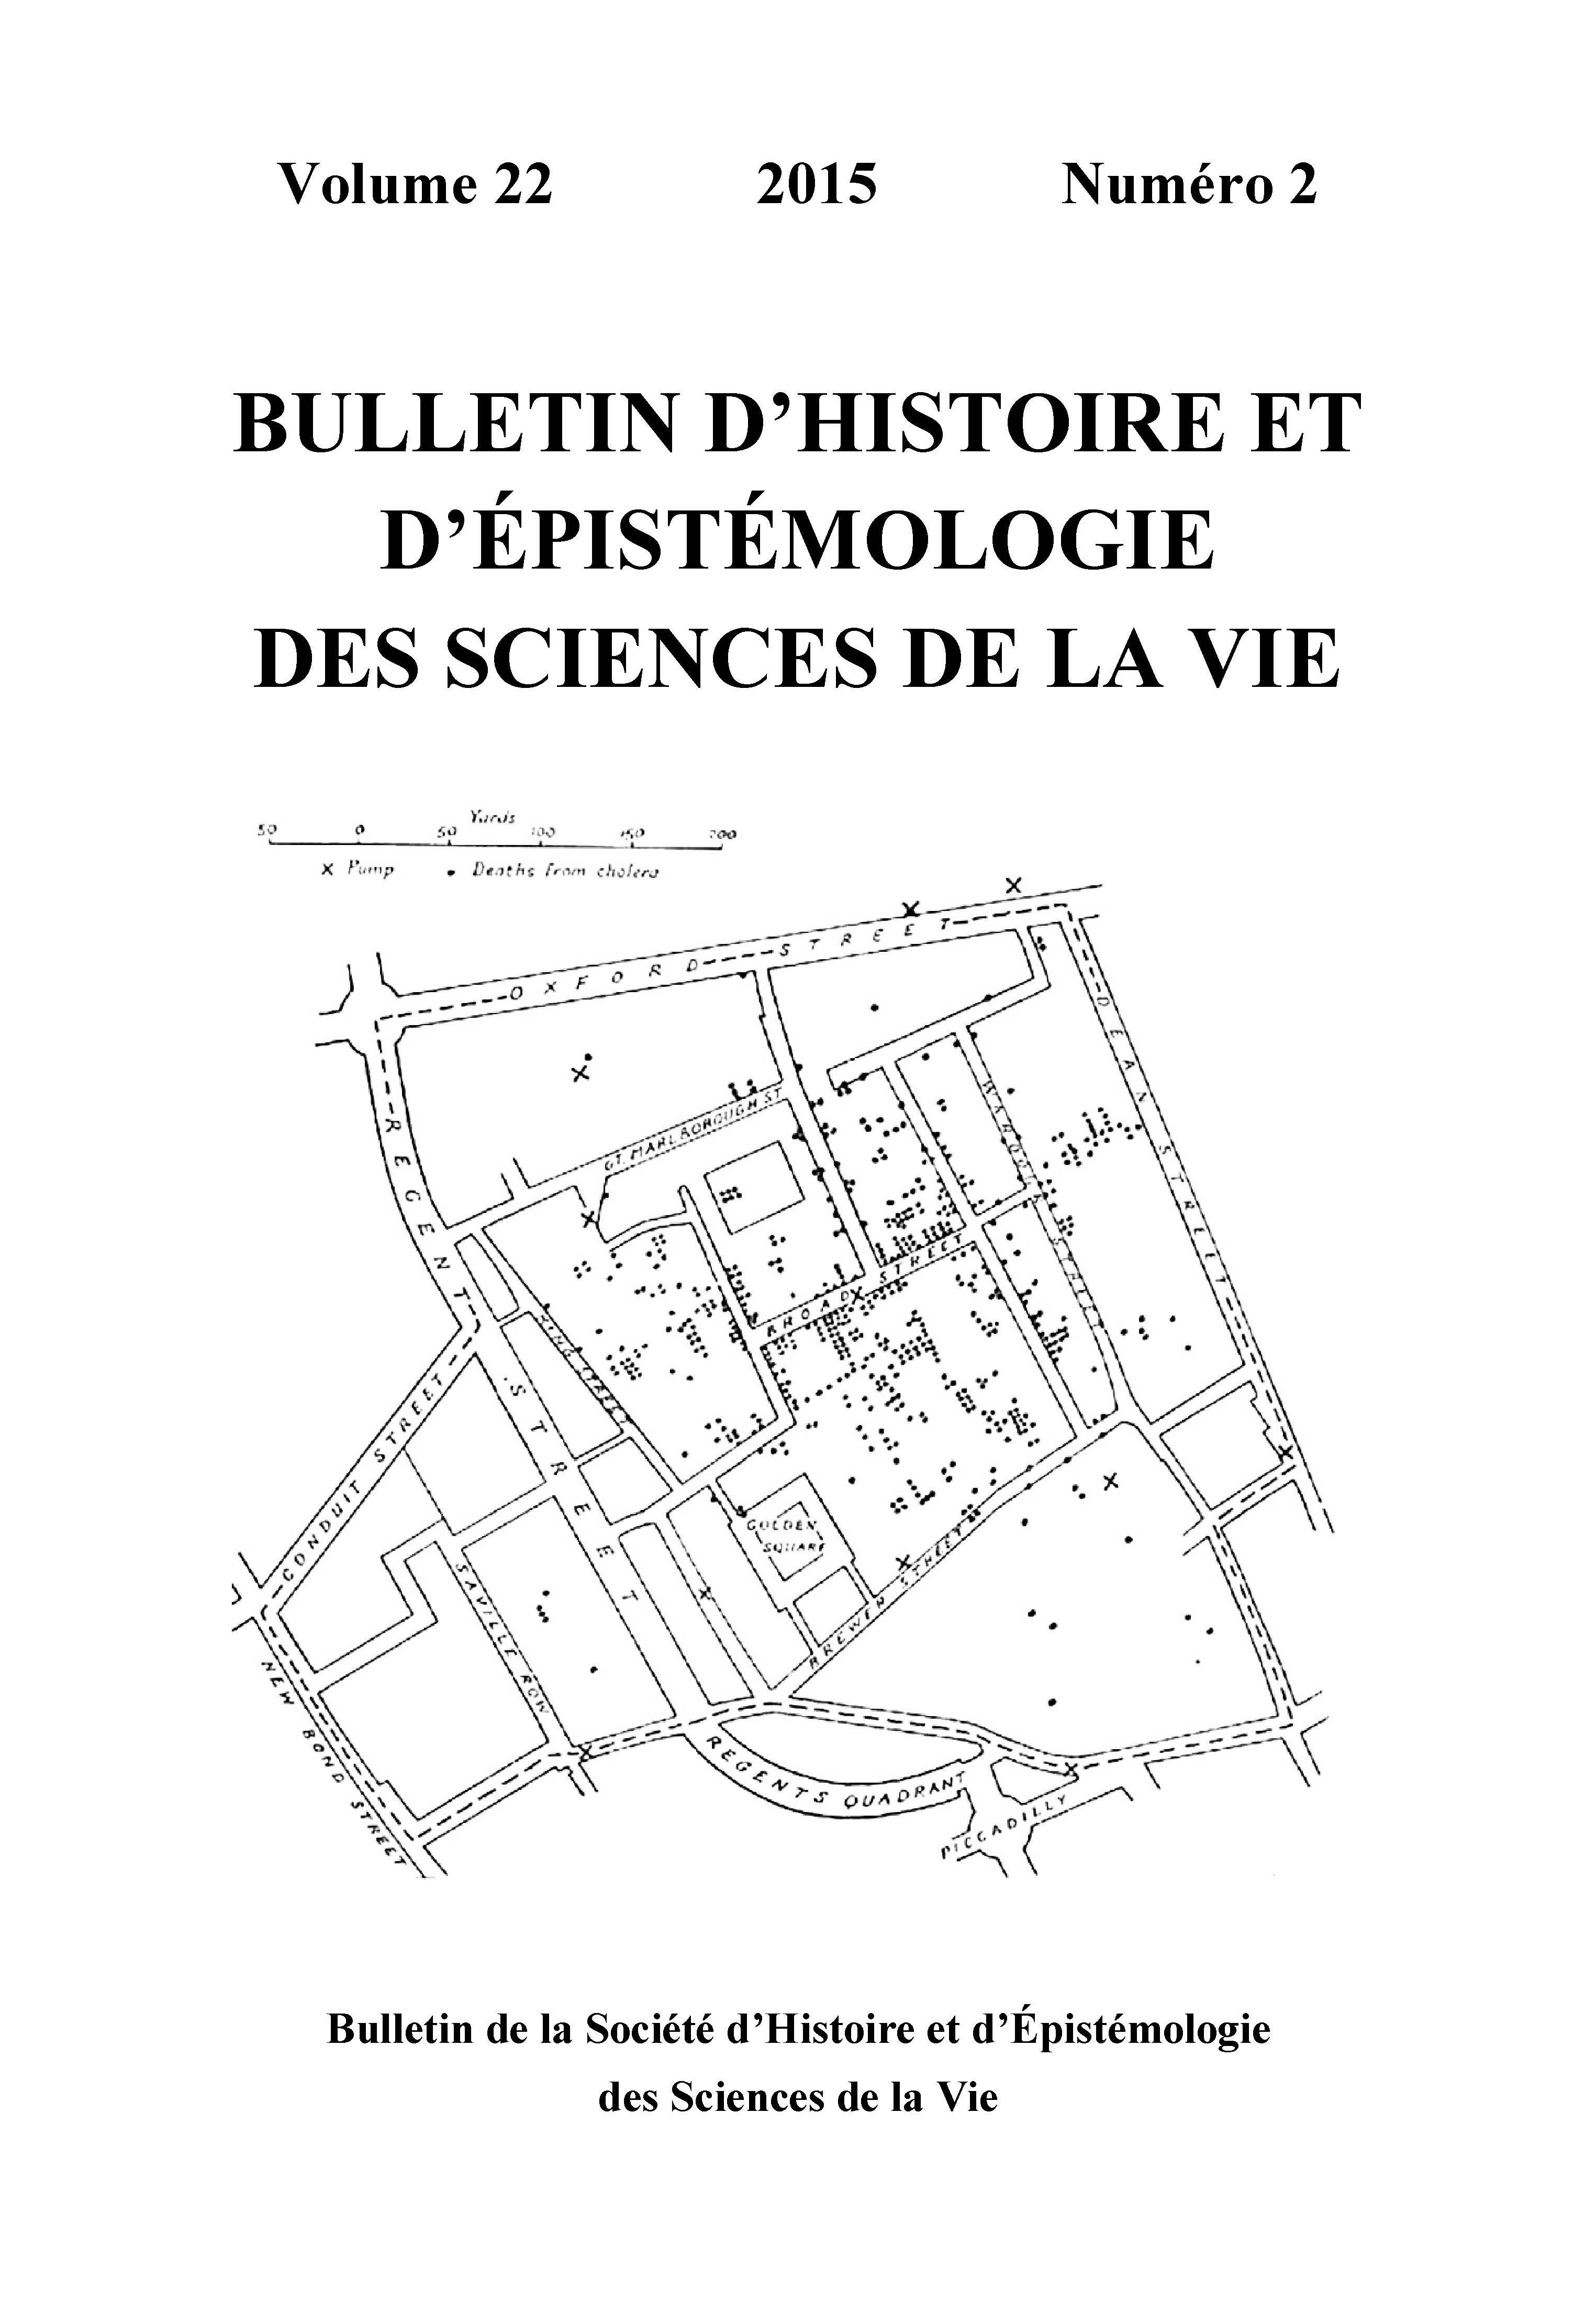 relative datation biologie définition